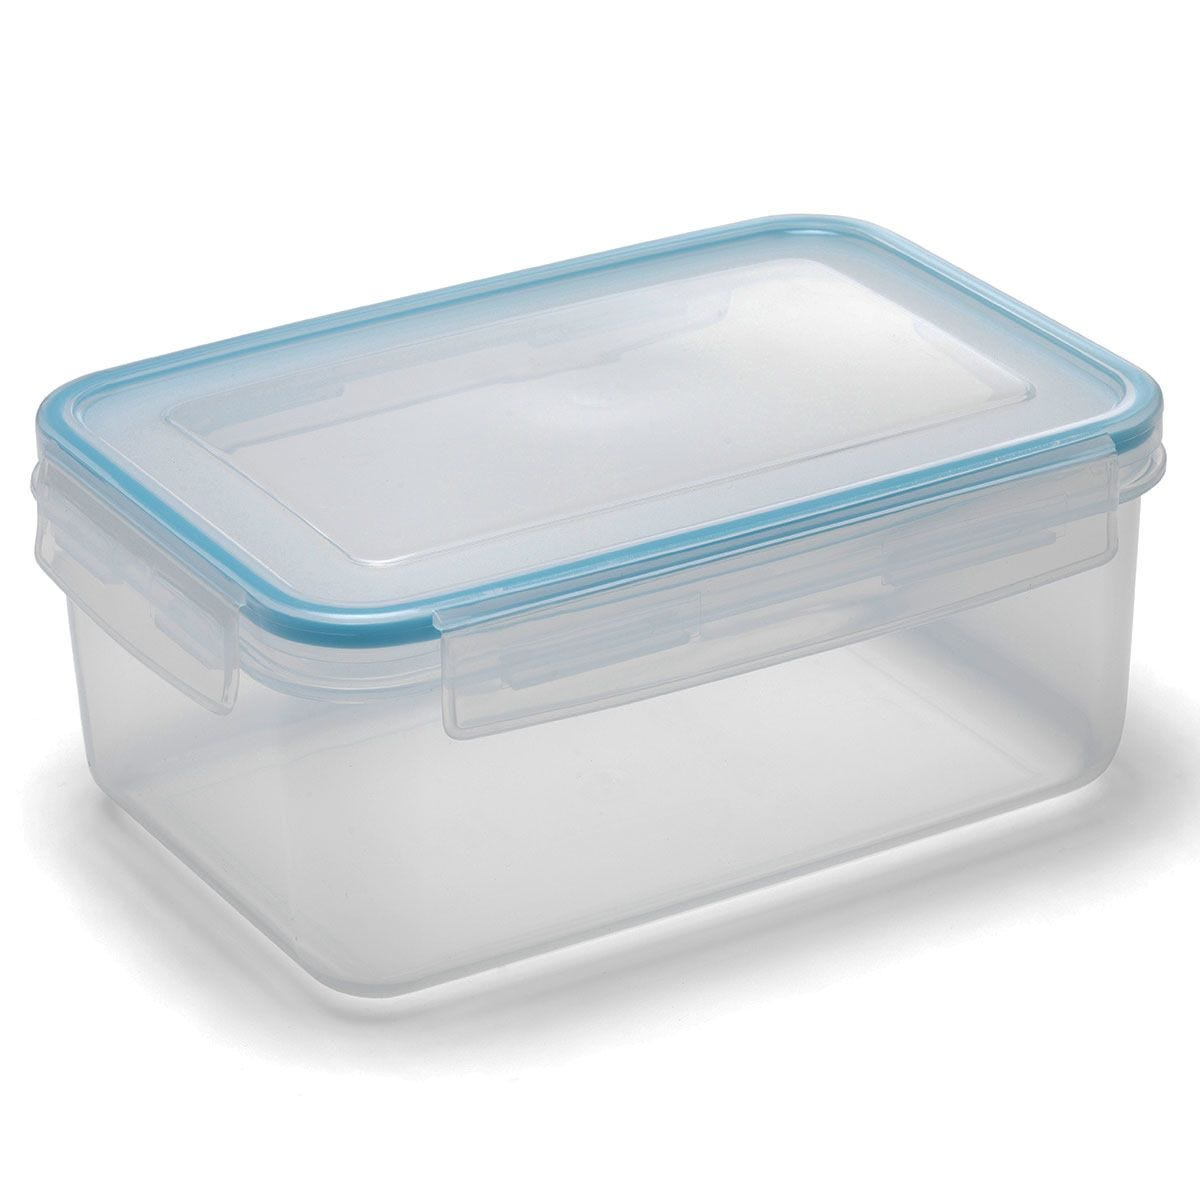 Addis Clip & Close Lunchbox Container - 2L